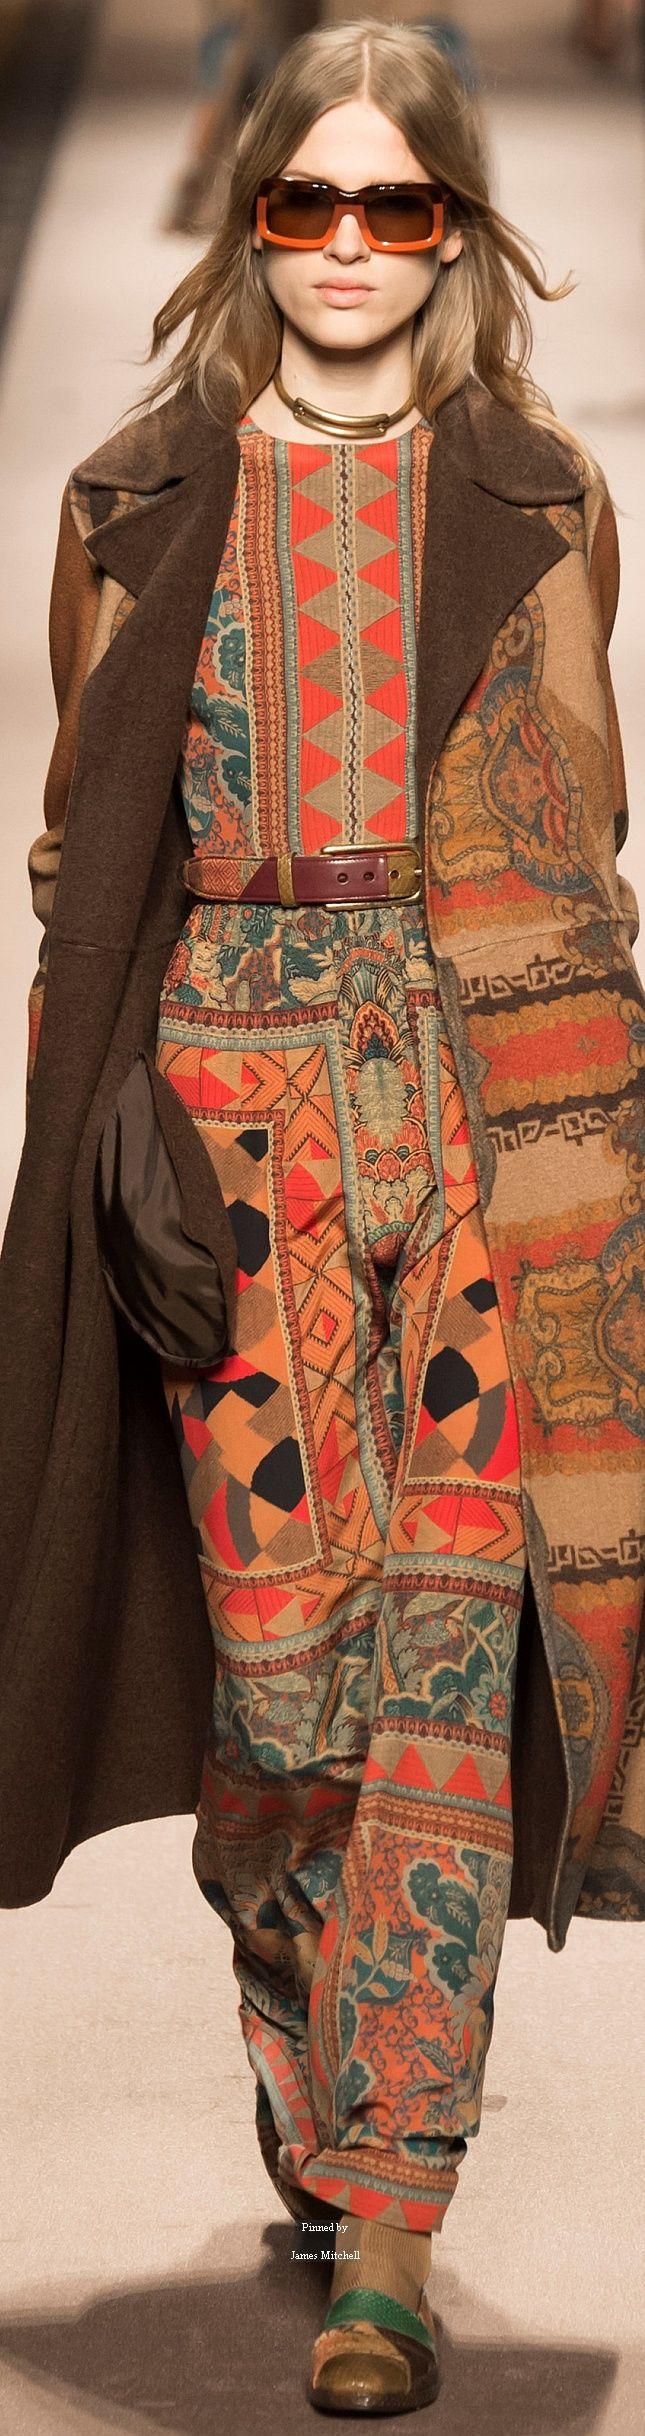 #Farbbberatung #Stilberatung #Farbenreich mit www.farben-reich.com Etro Collections Fall Winter 2015-16 collection